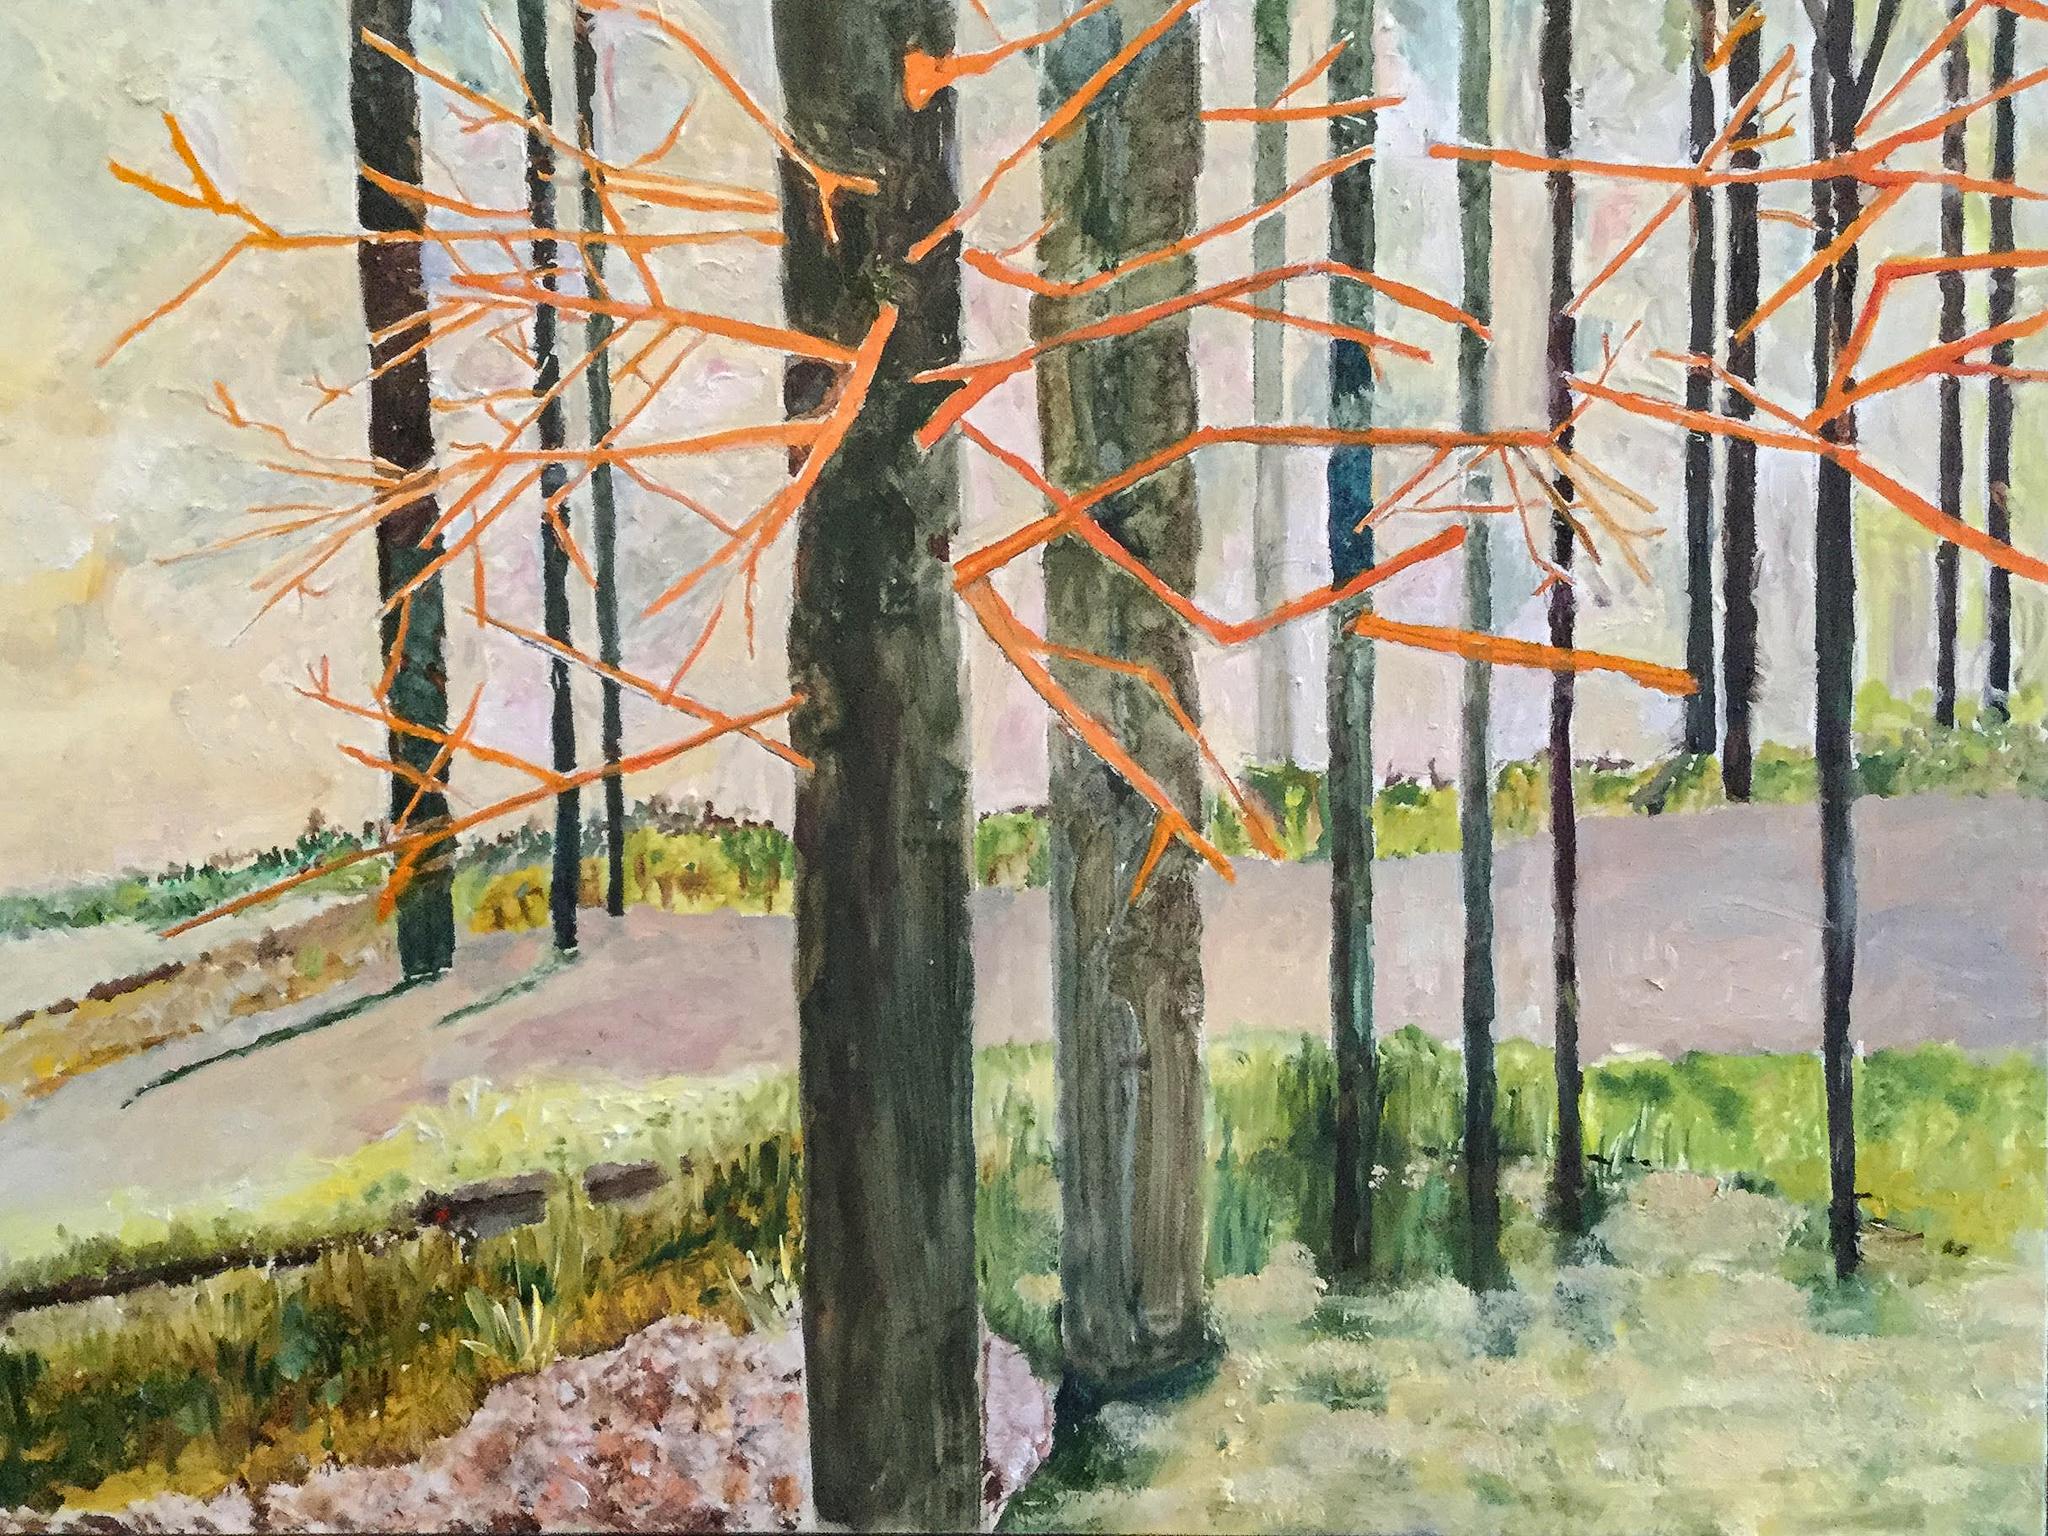 Dark Trees in Sunshine